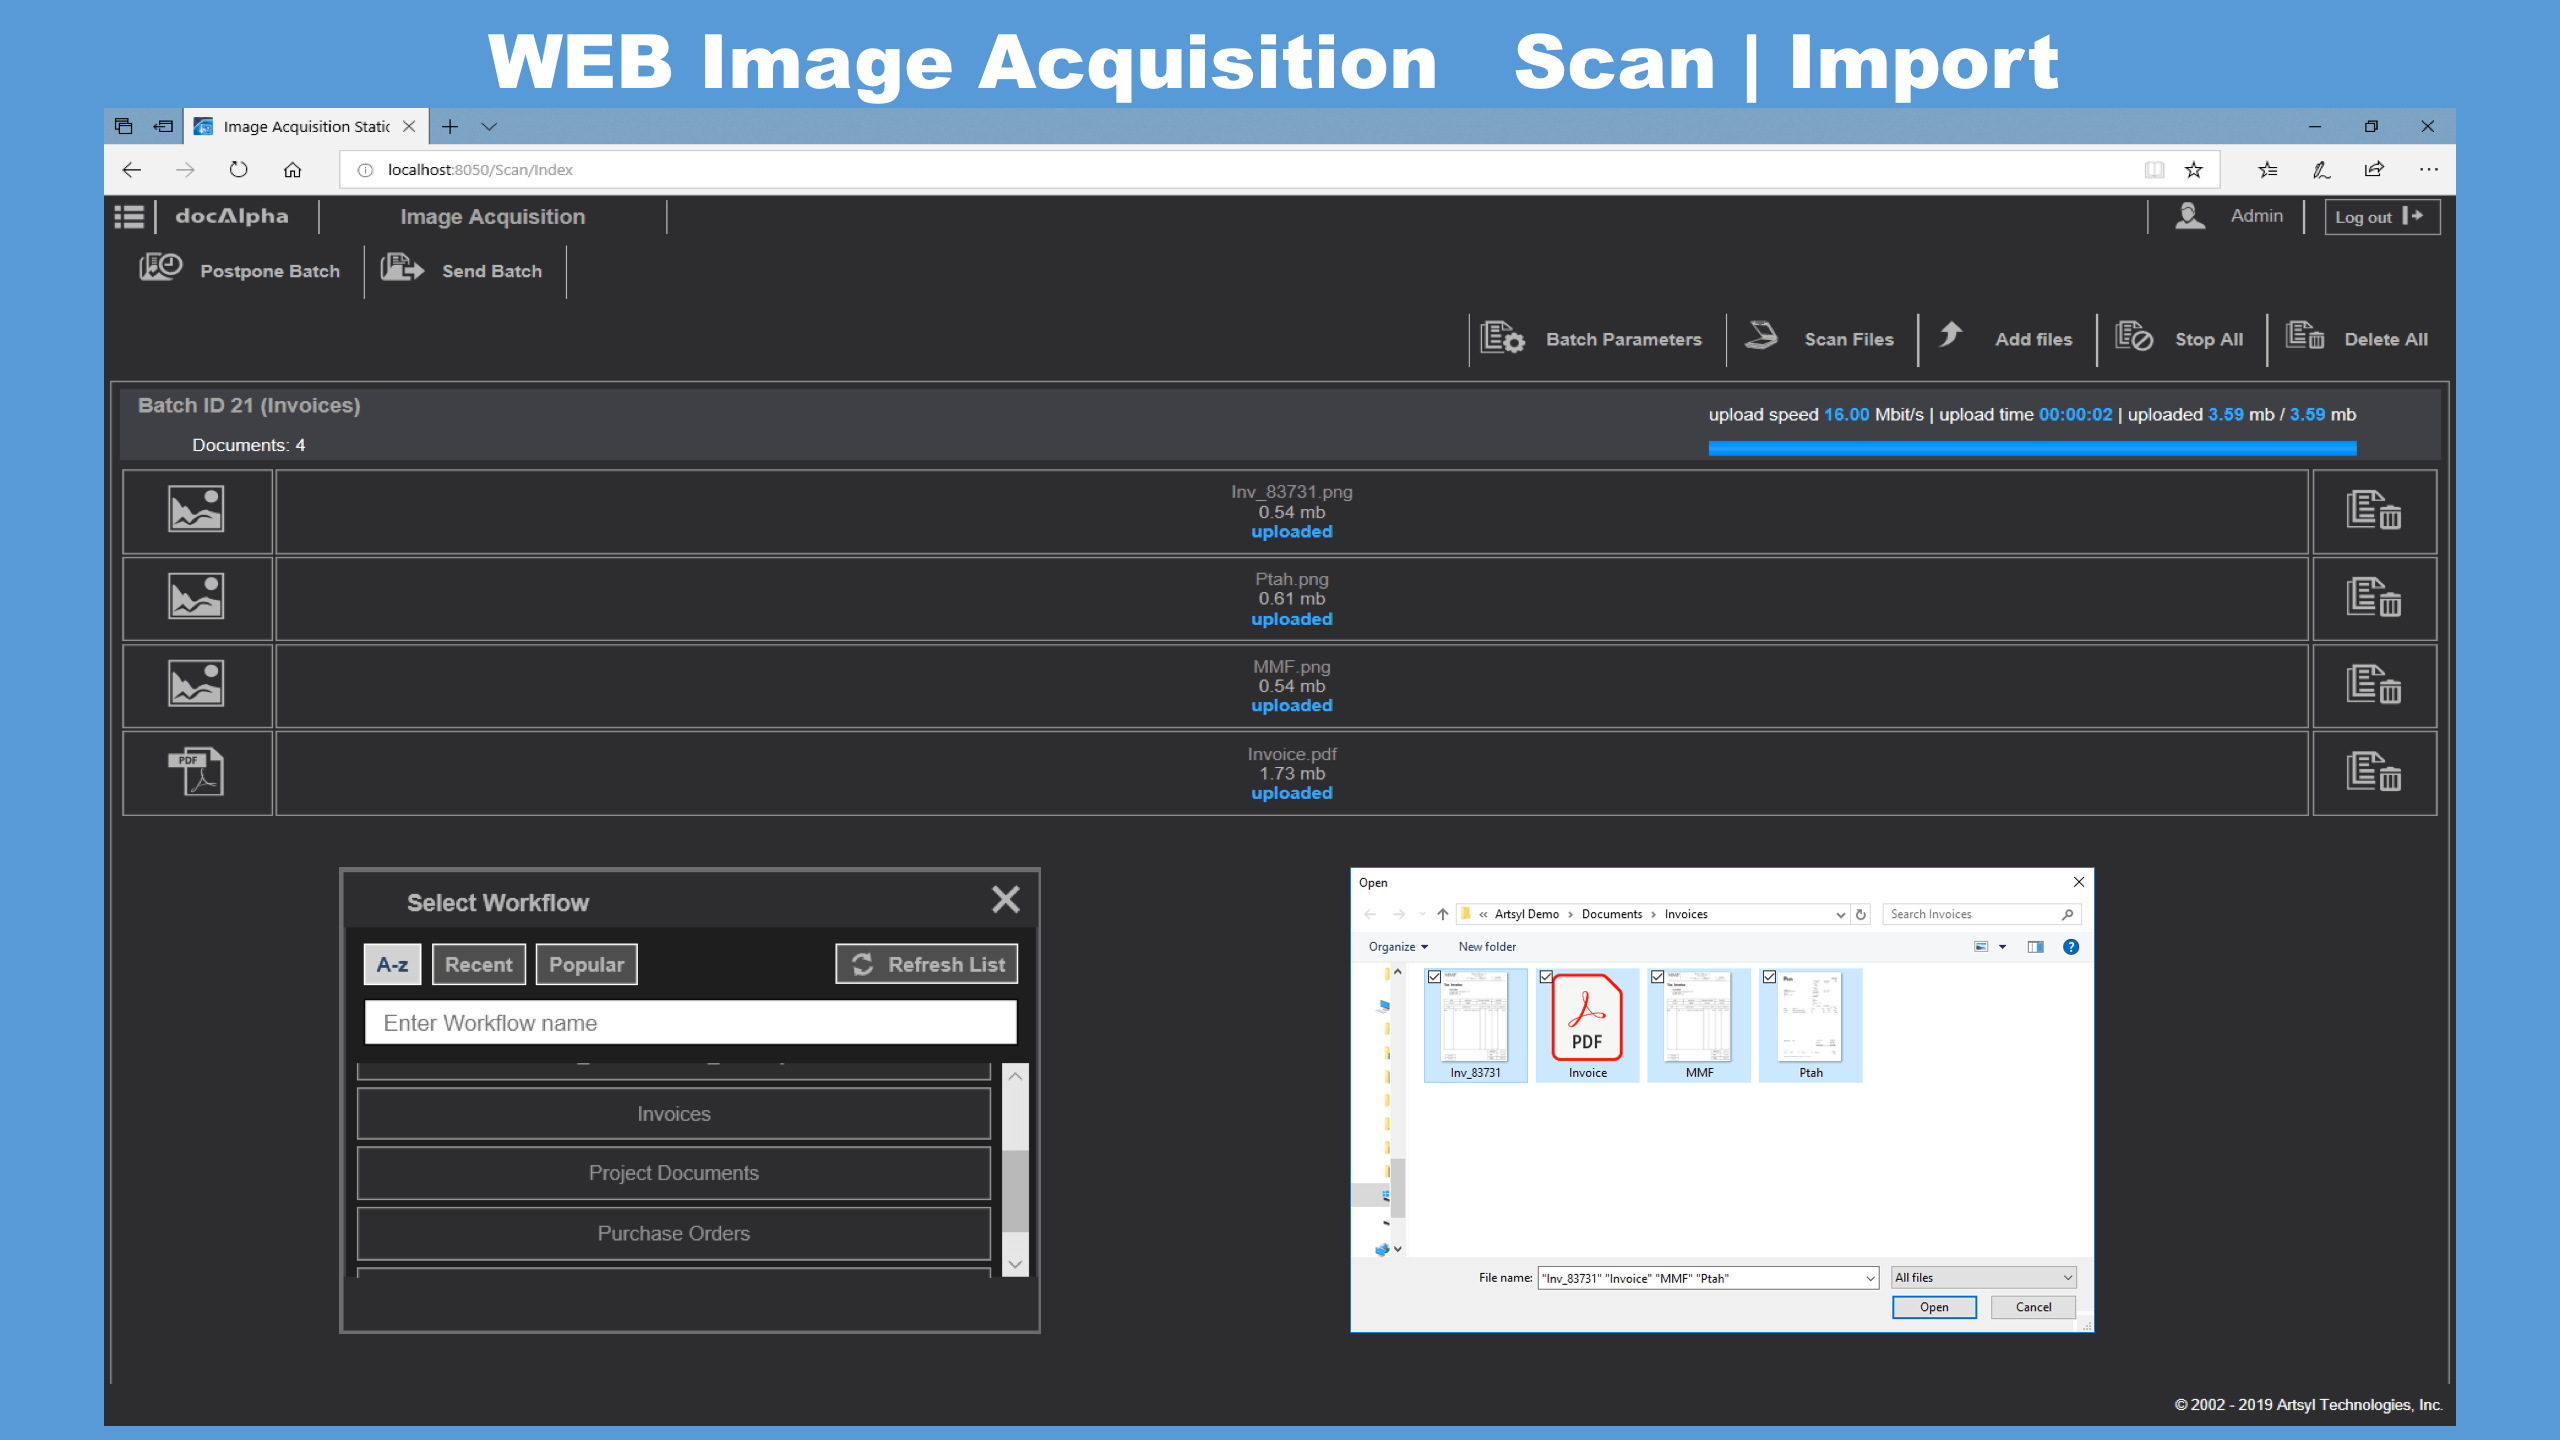 Screenshot 1a Updated